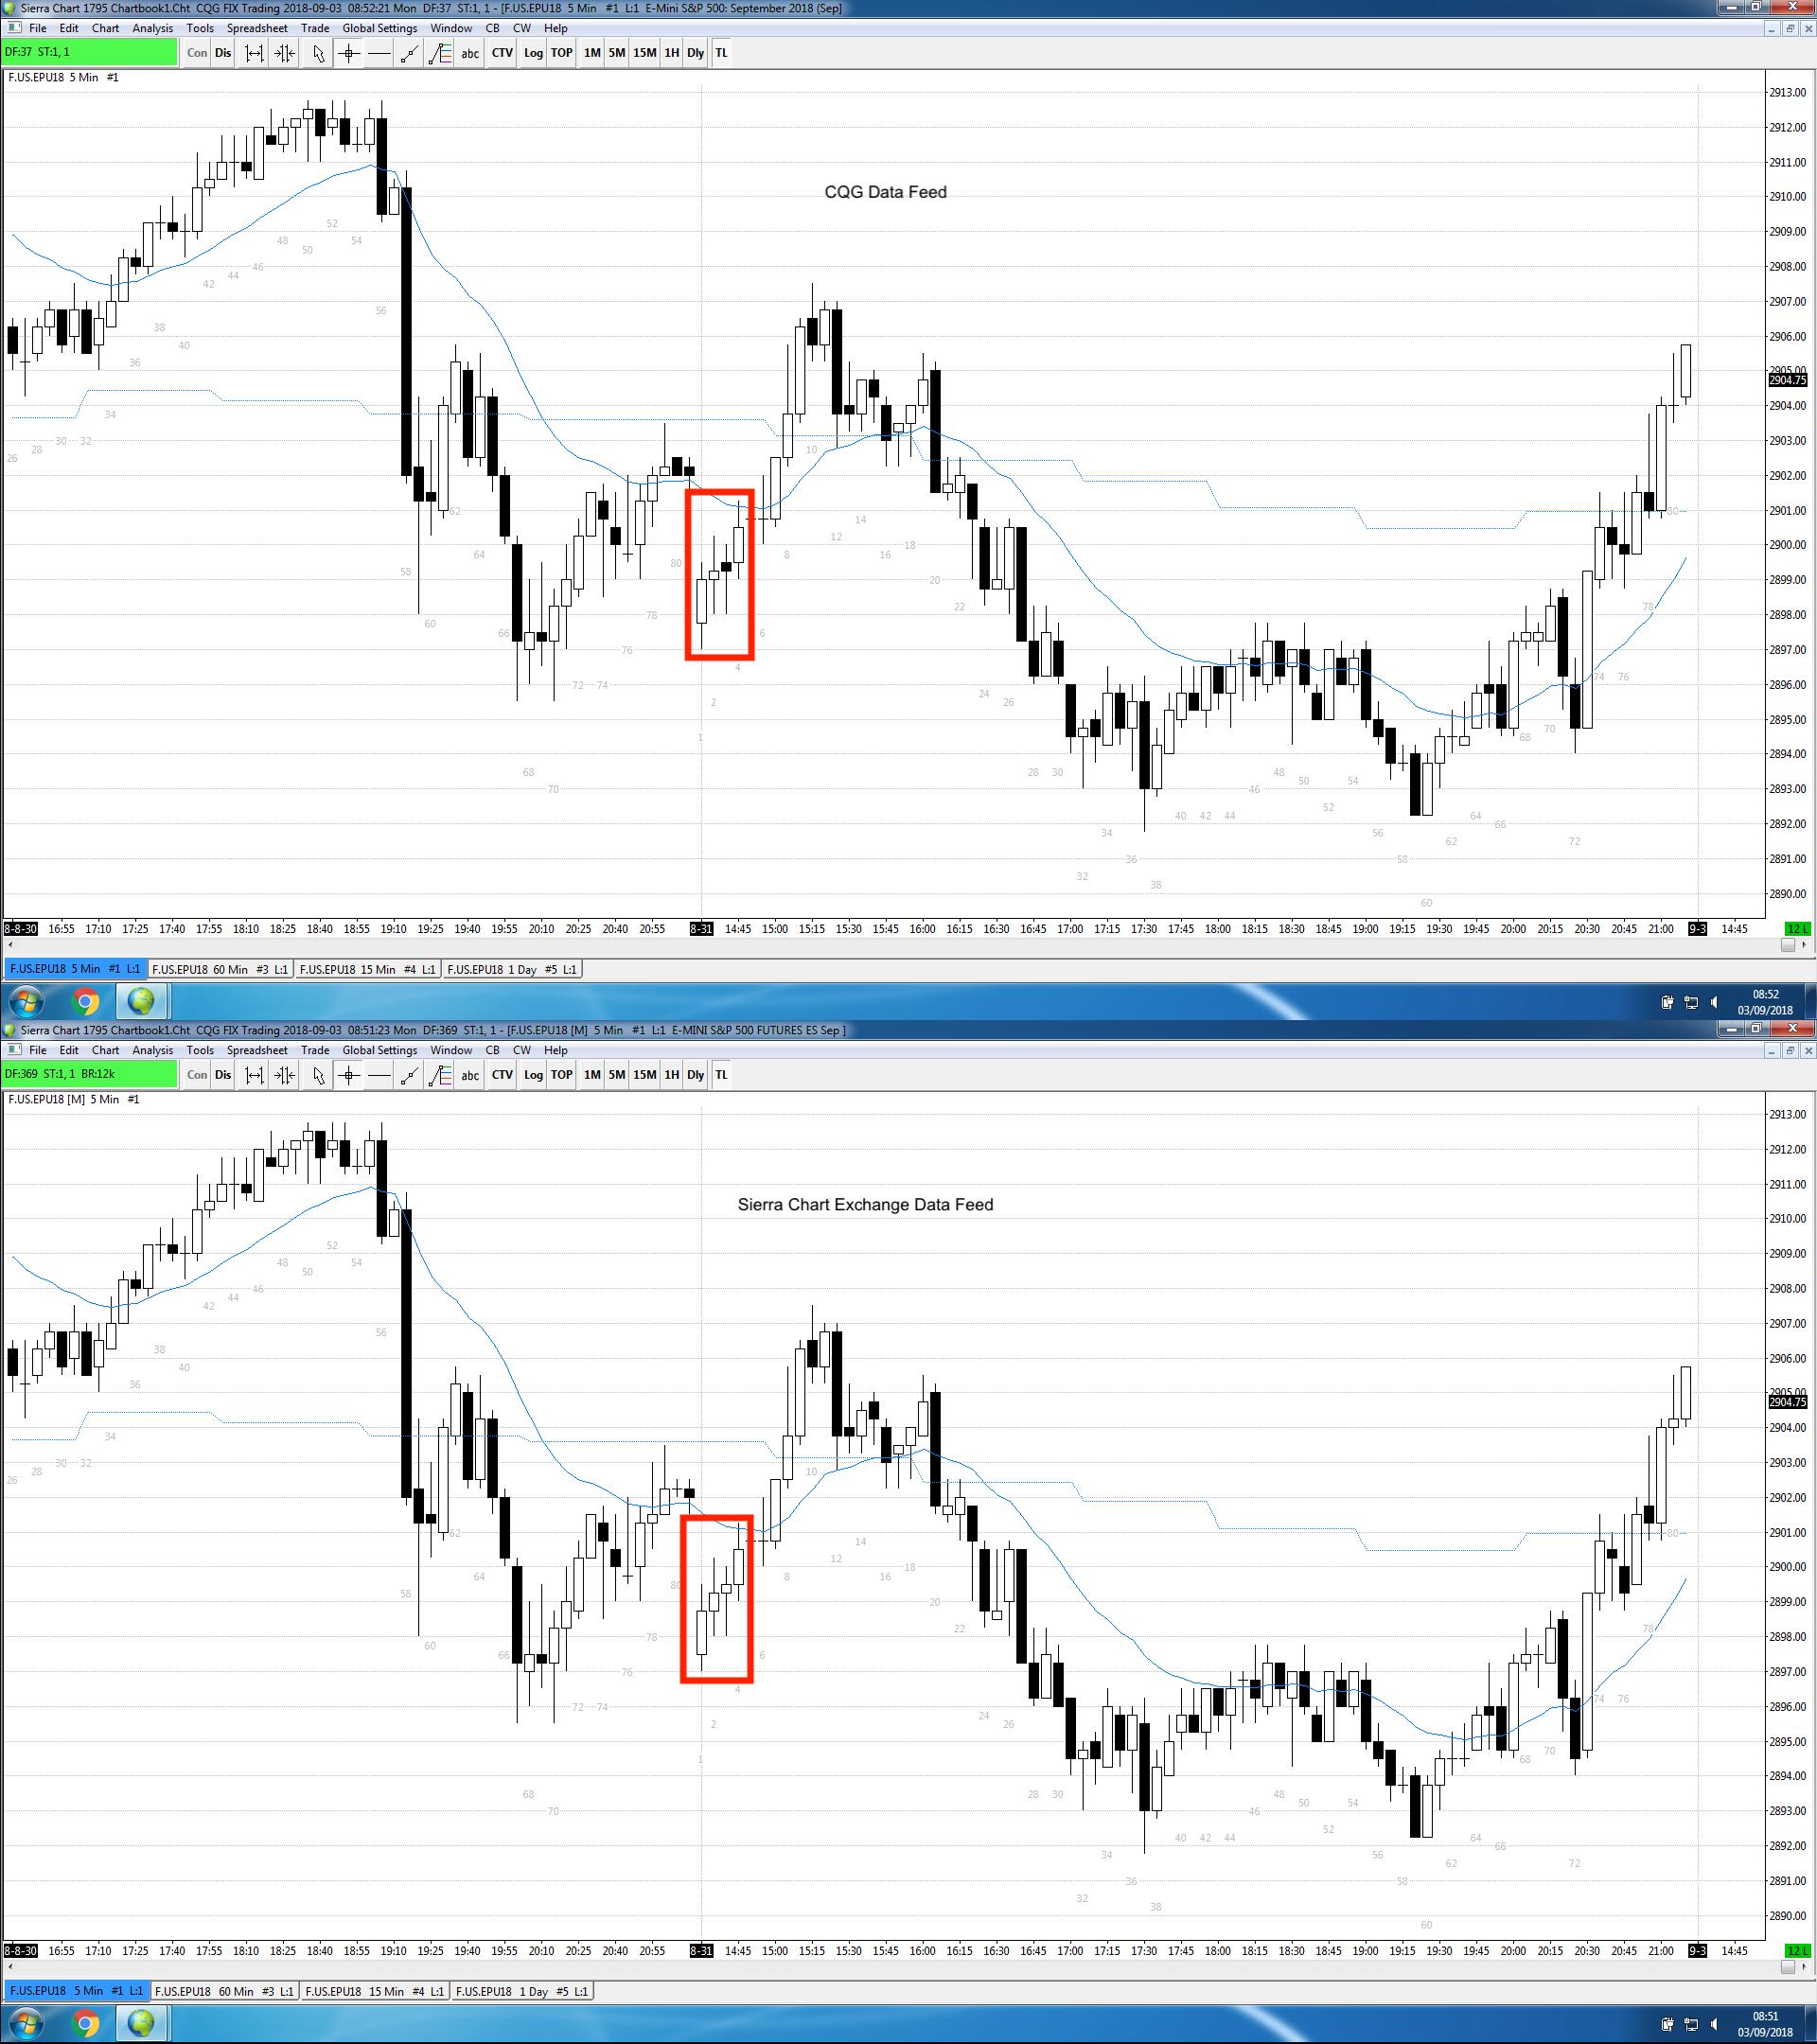 Inaccurate CQG data when compared to CME - Trading Plaforms